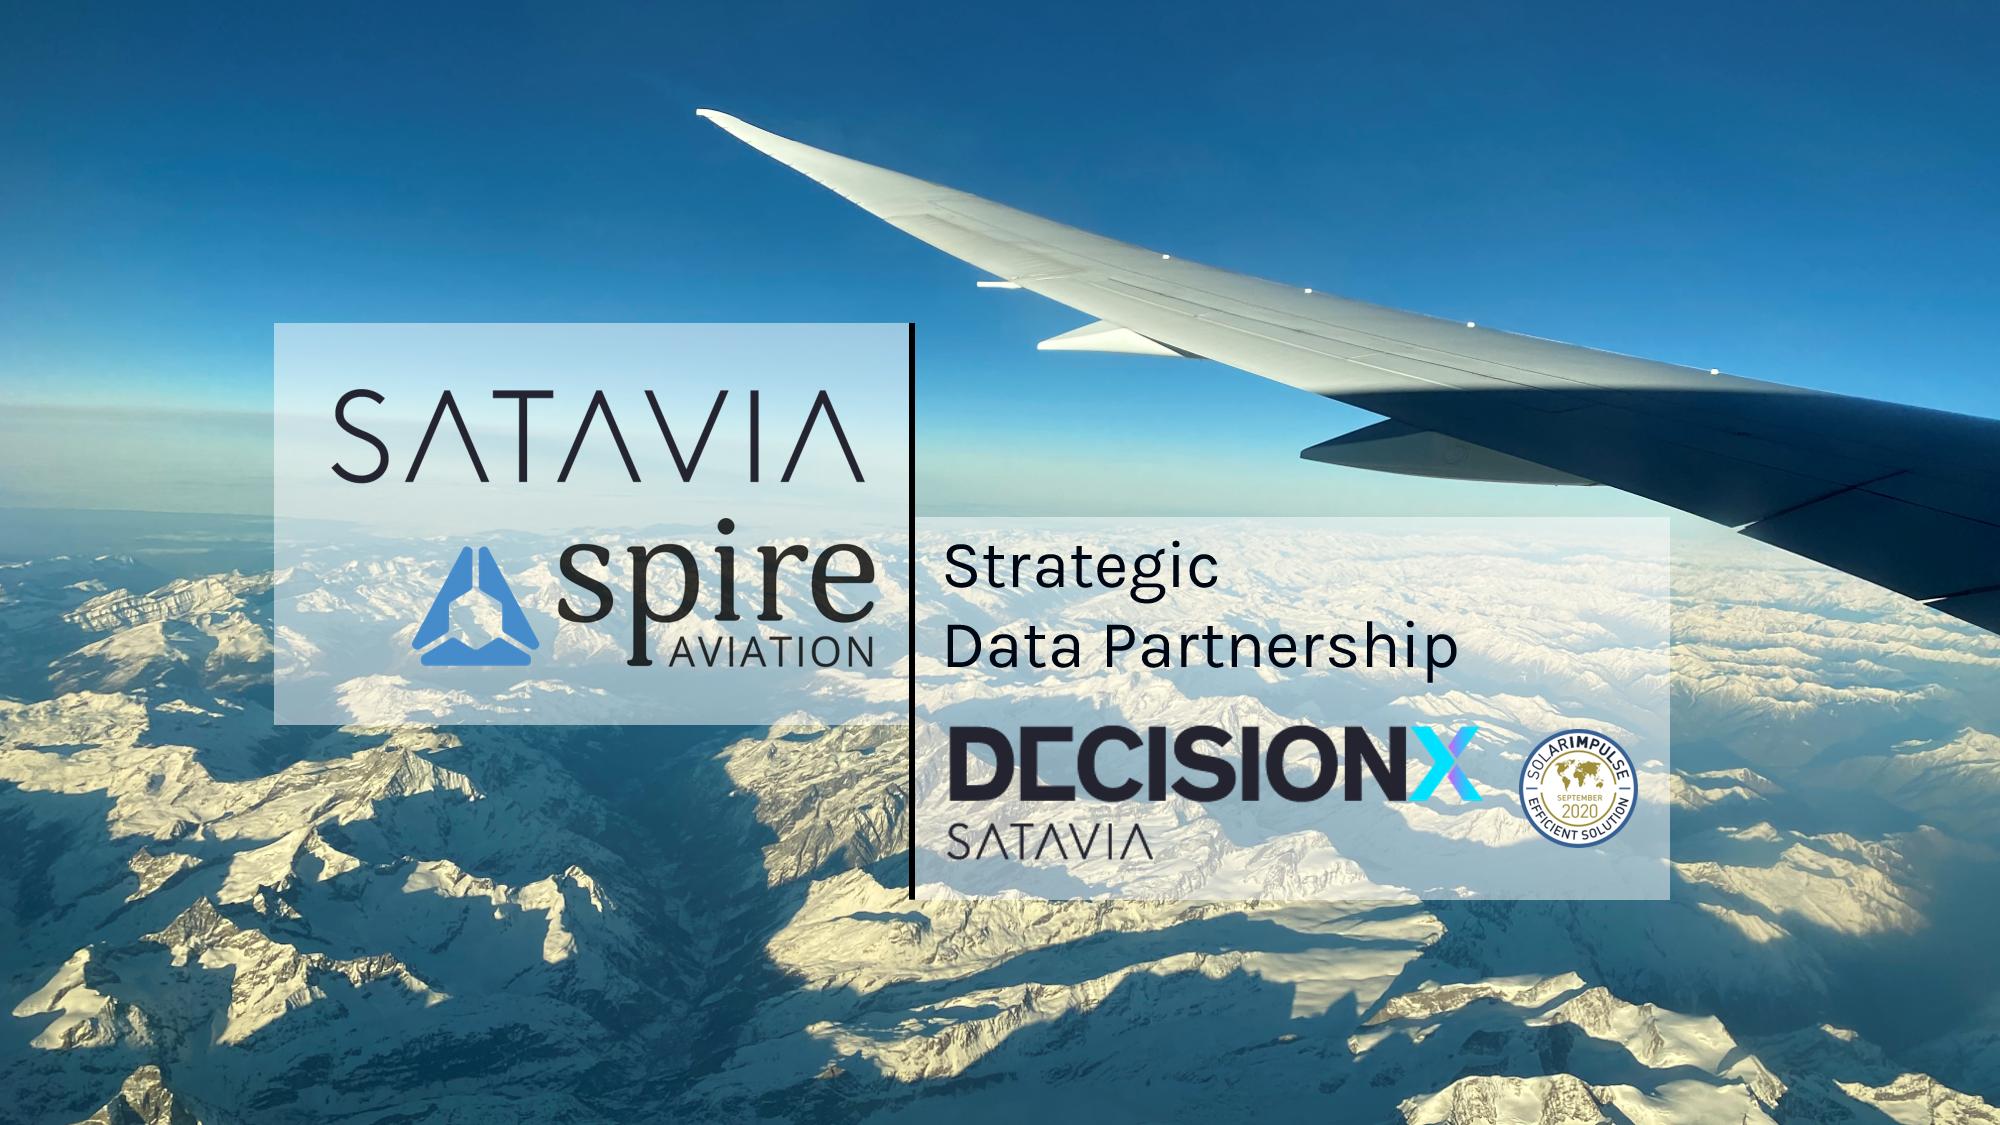 Spire Aviation and SATAVIA's Strategic Data Partnership